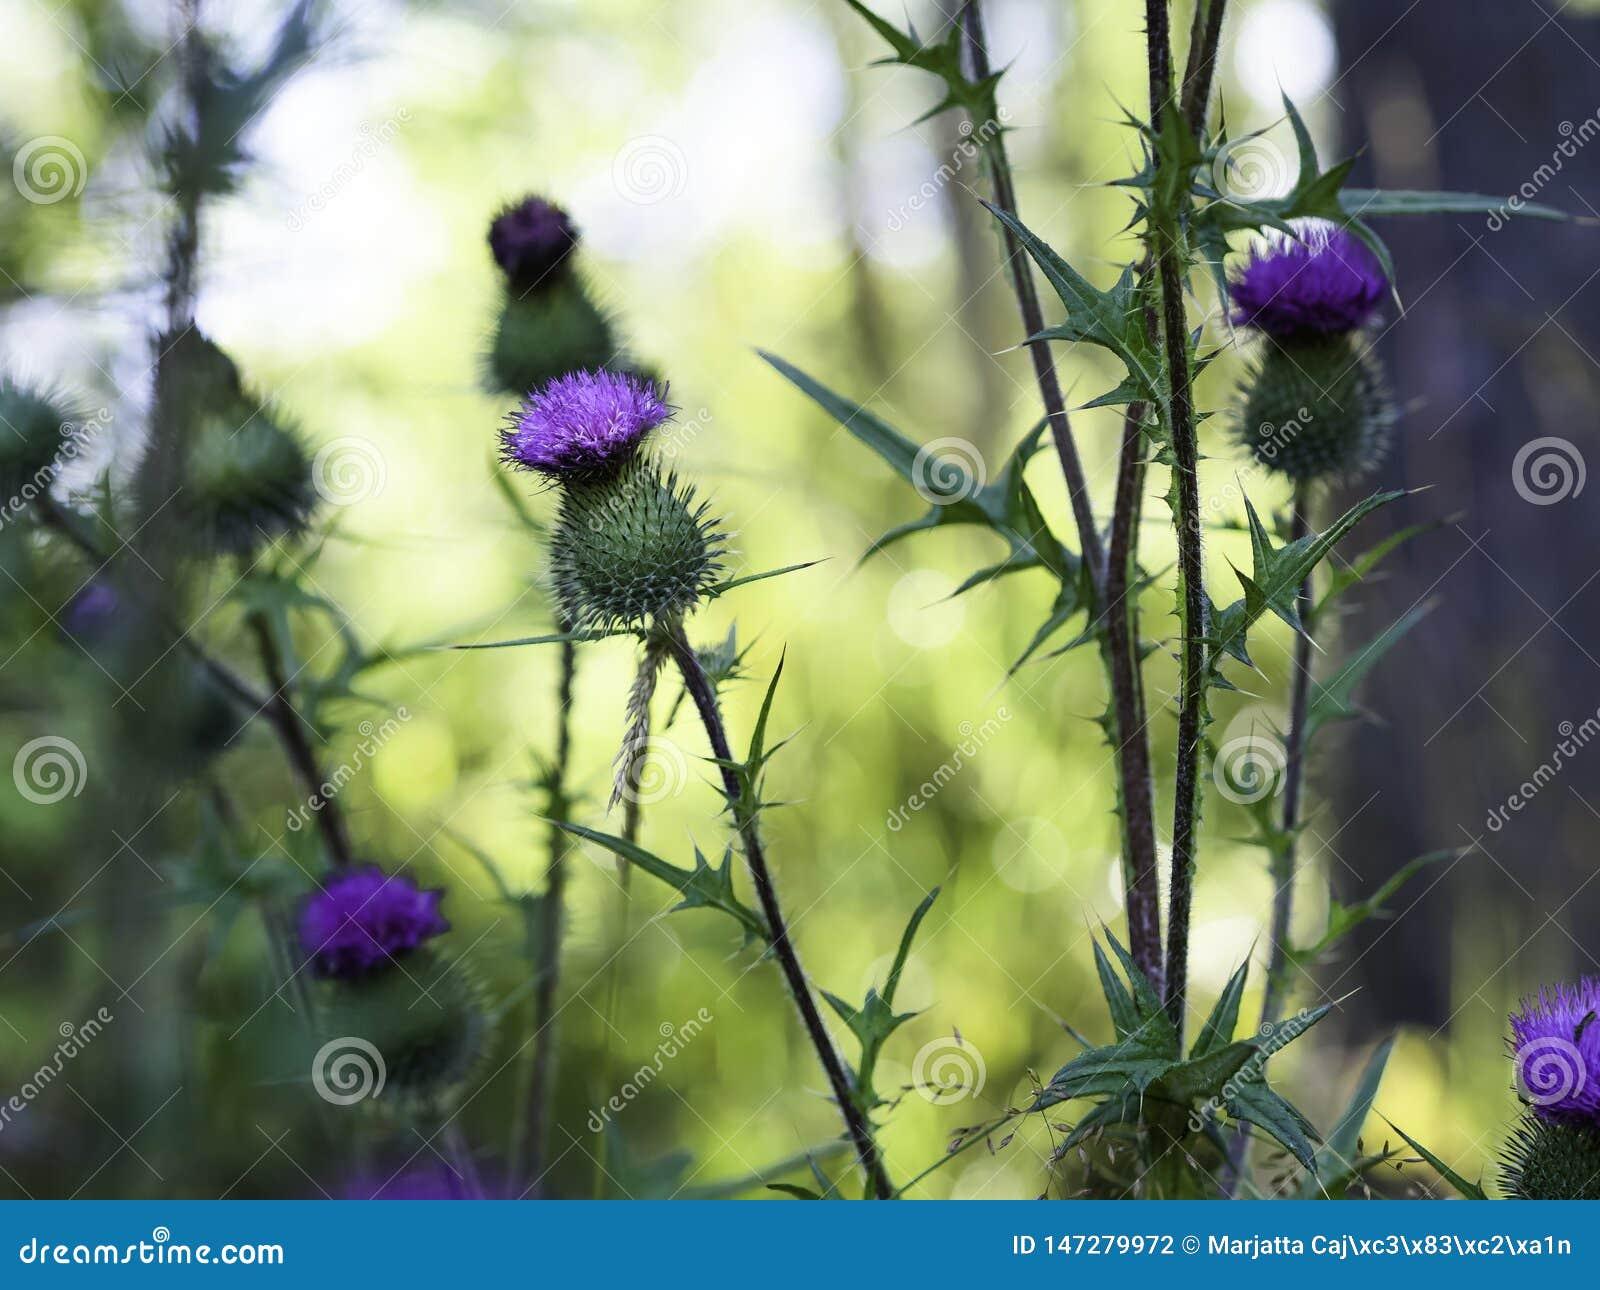 Stangendistel - Cirsium vulgare